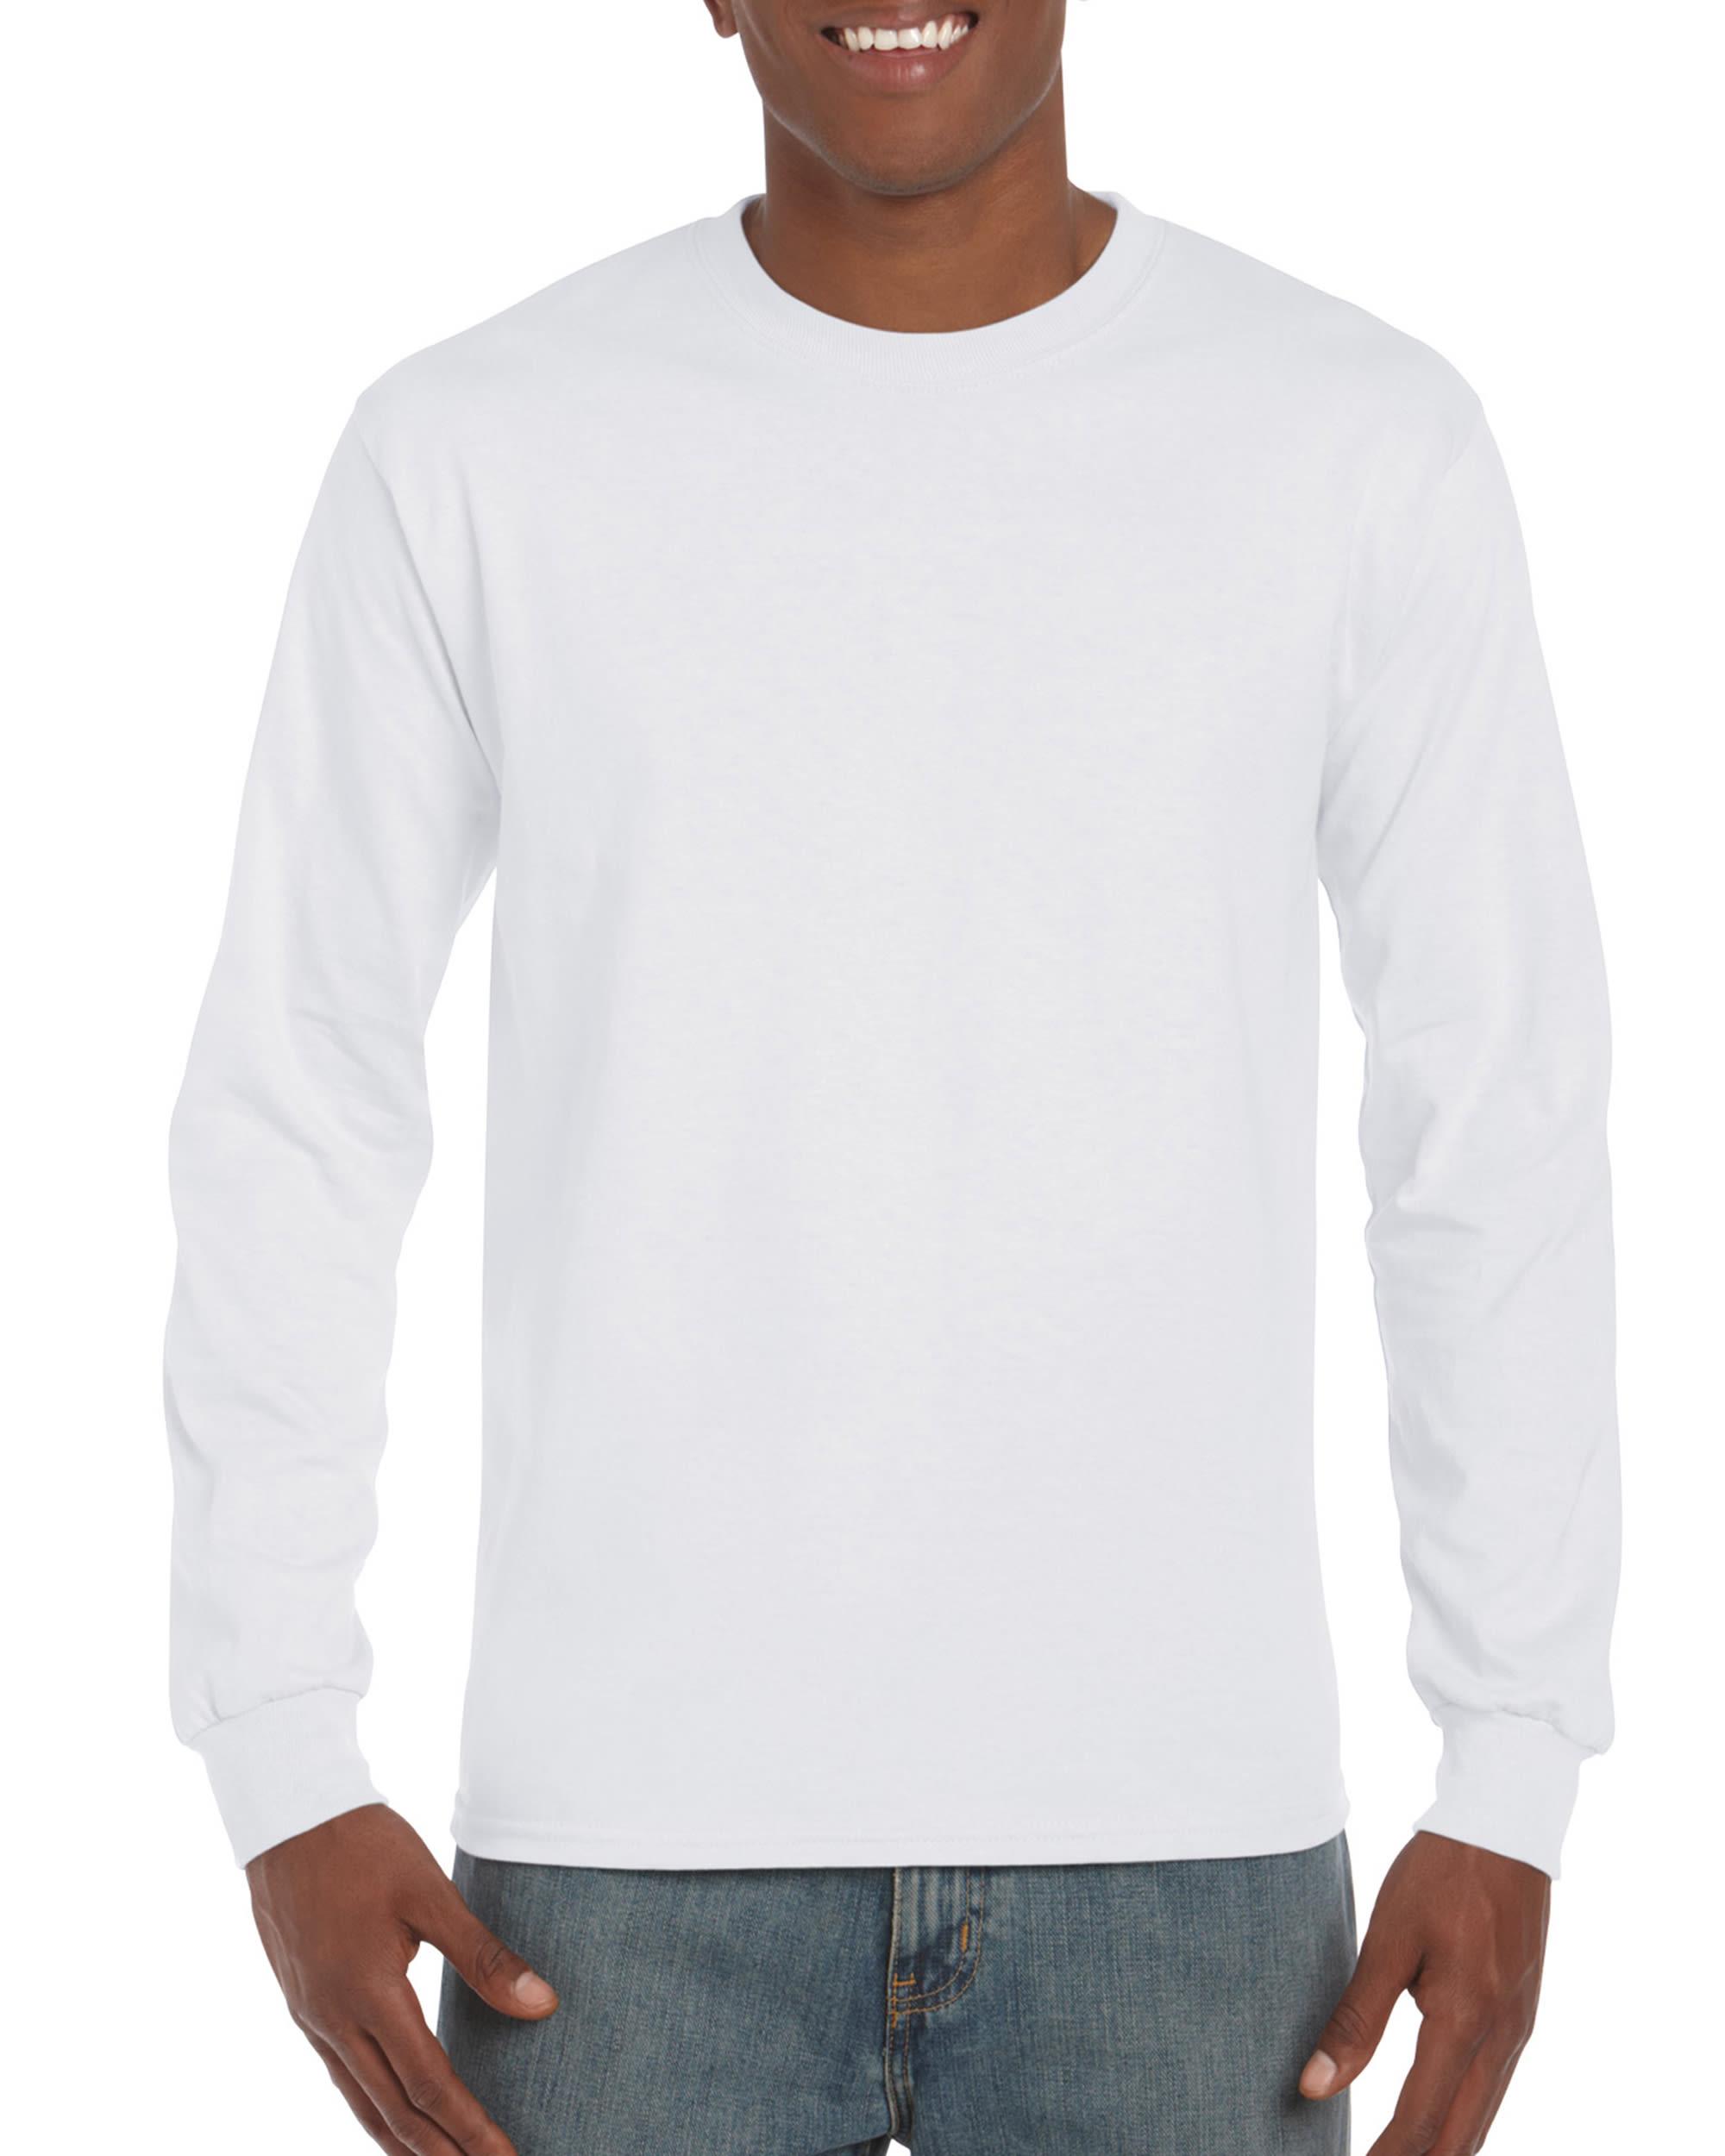 9e0caf73199 Custom Printed Gildan Ultra Cotton Long Sleeve - Coastal Reign